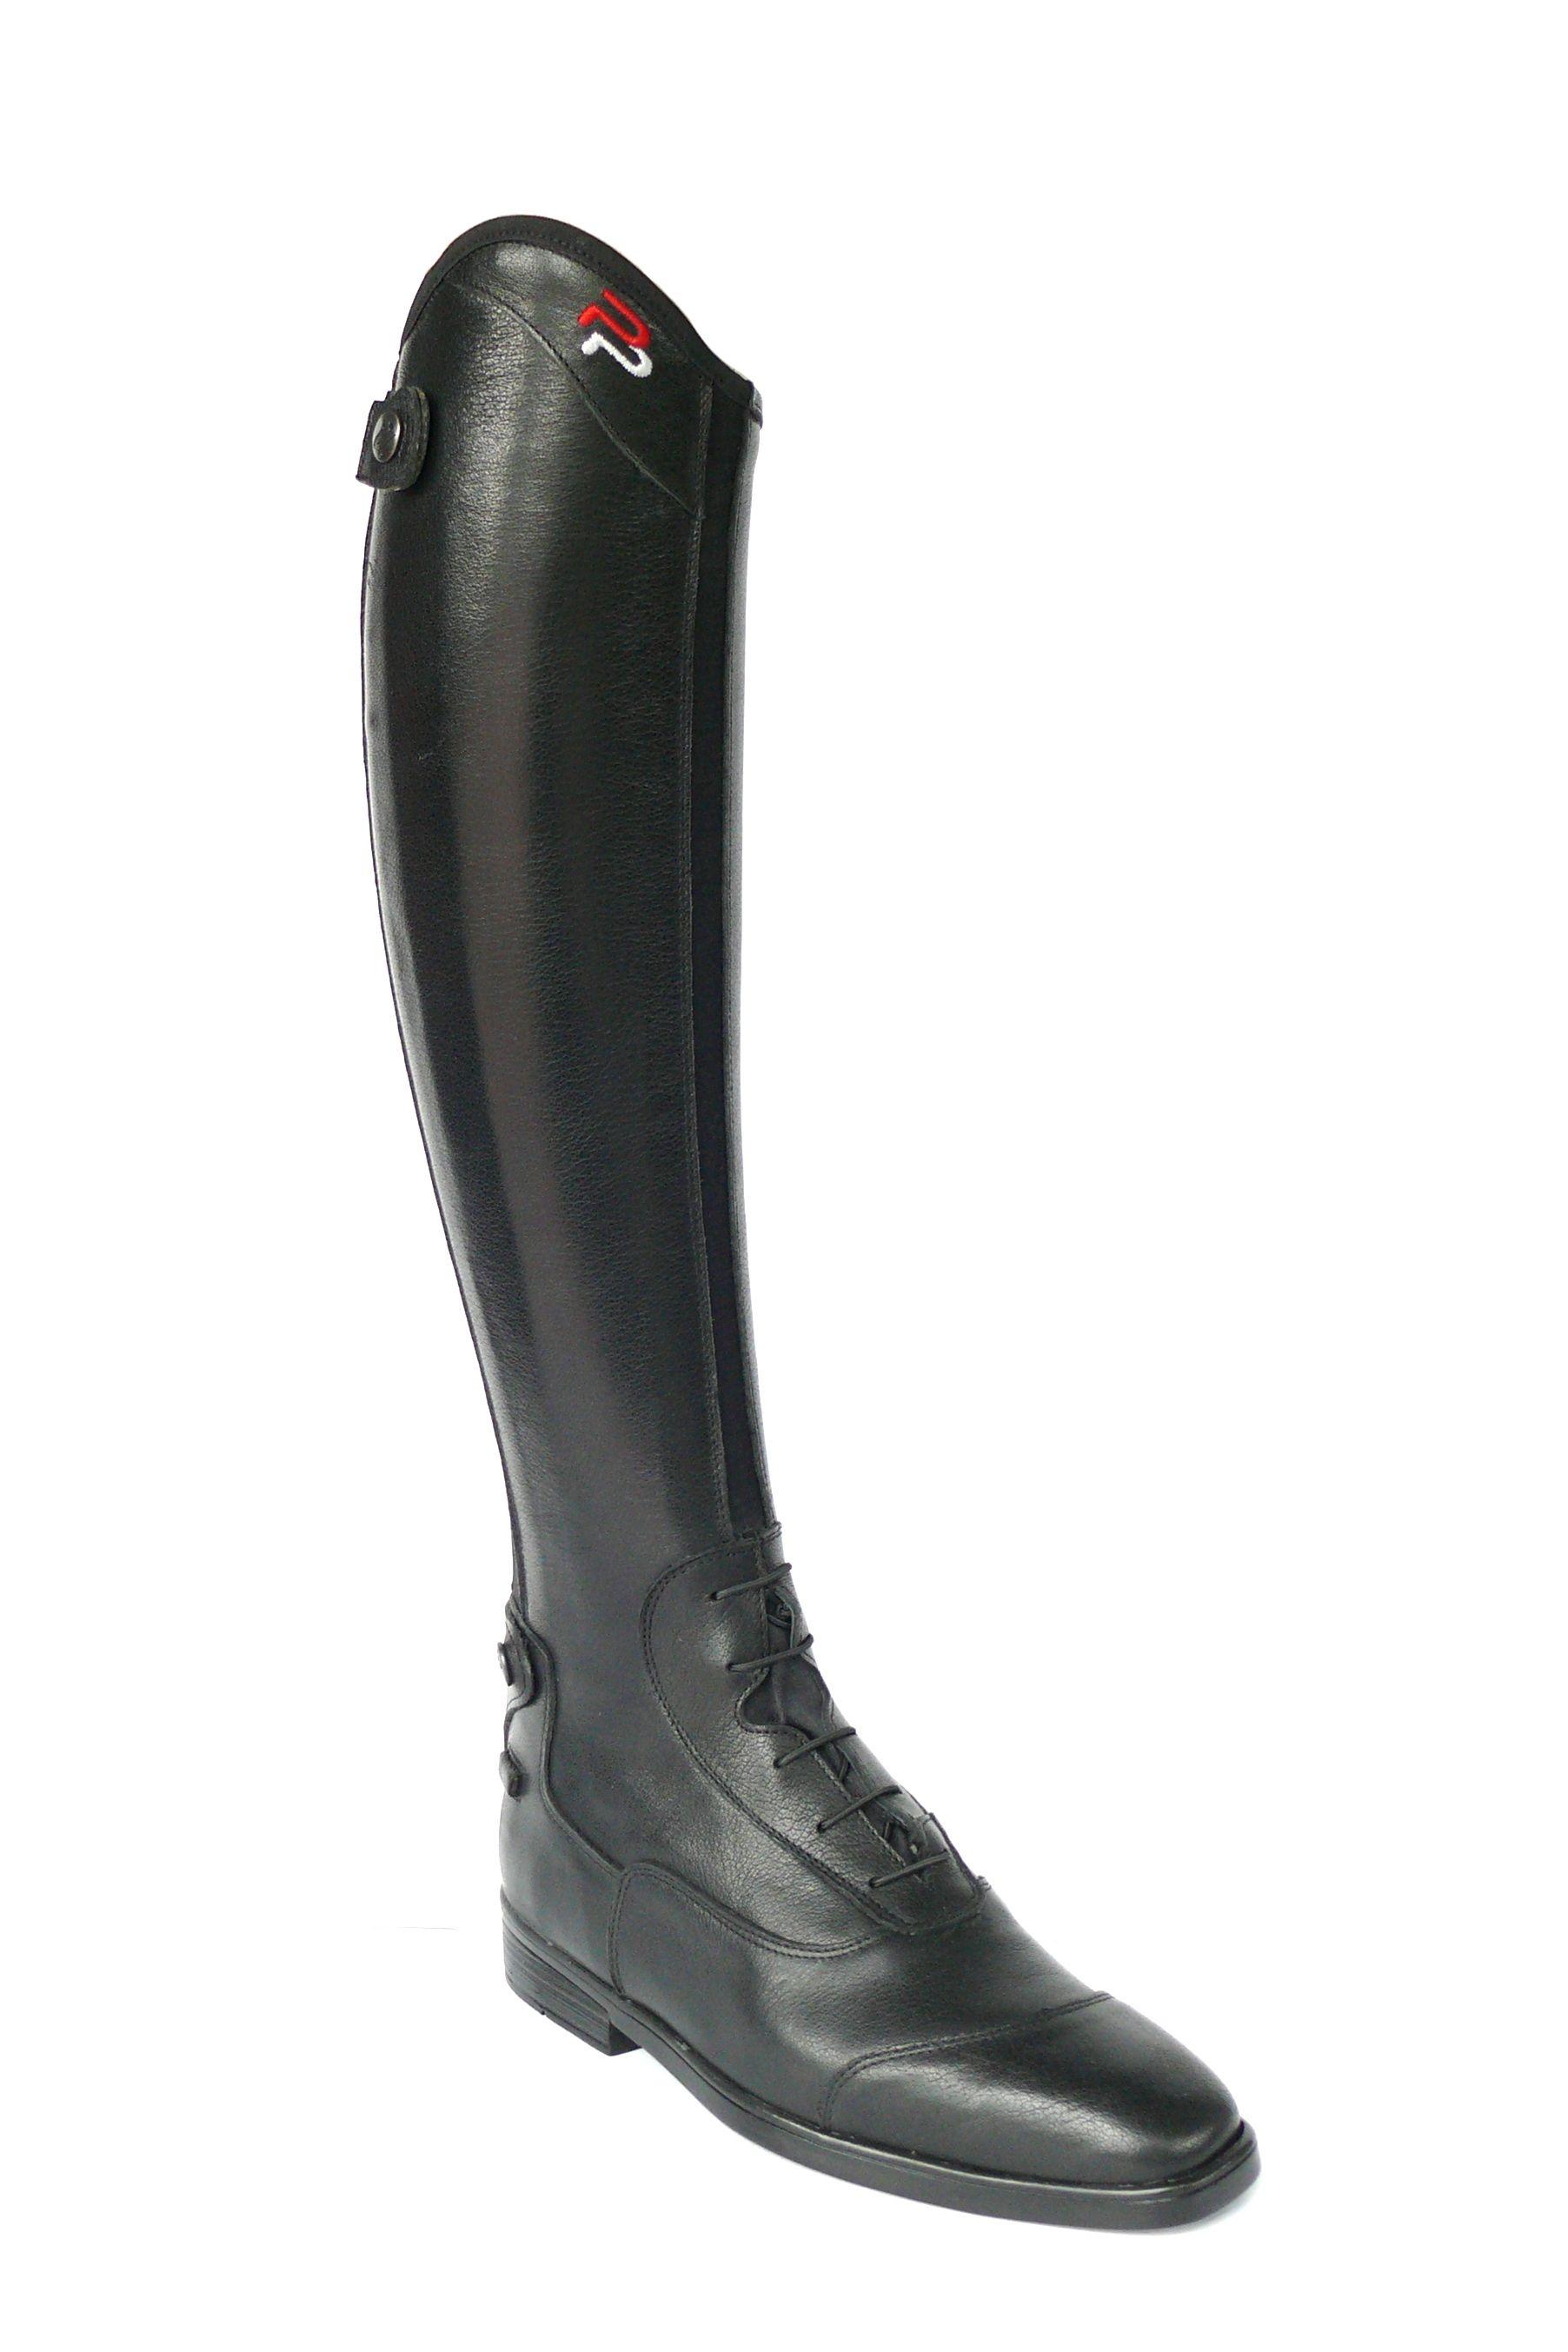 97345b95e62ac Long Riding Boots Ariat Womens Monaco Tall Stretch Zip Riding Boots Black  Patent